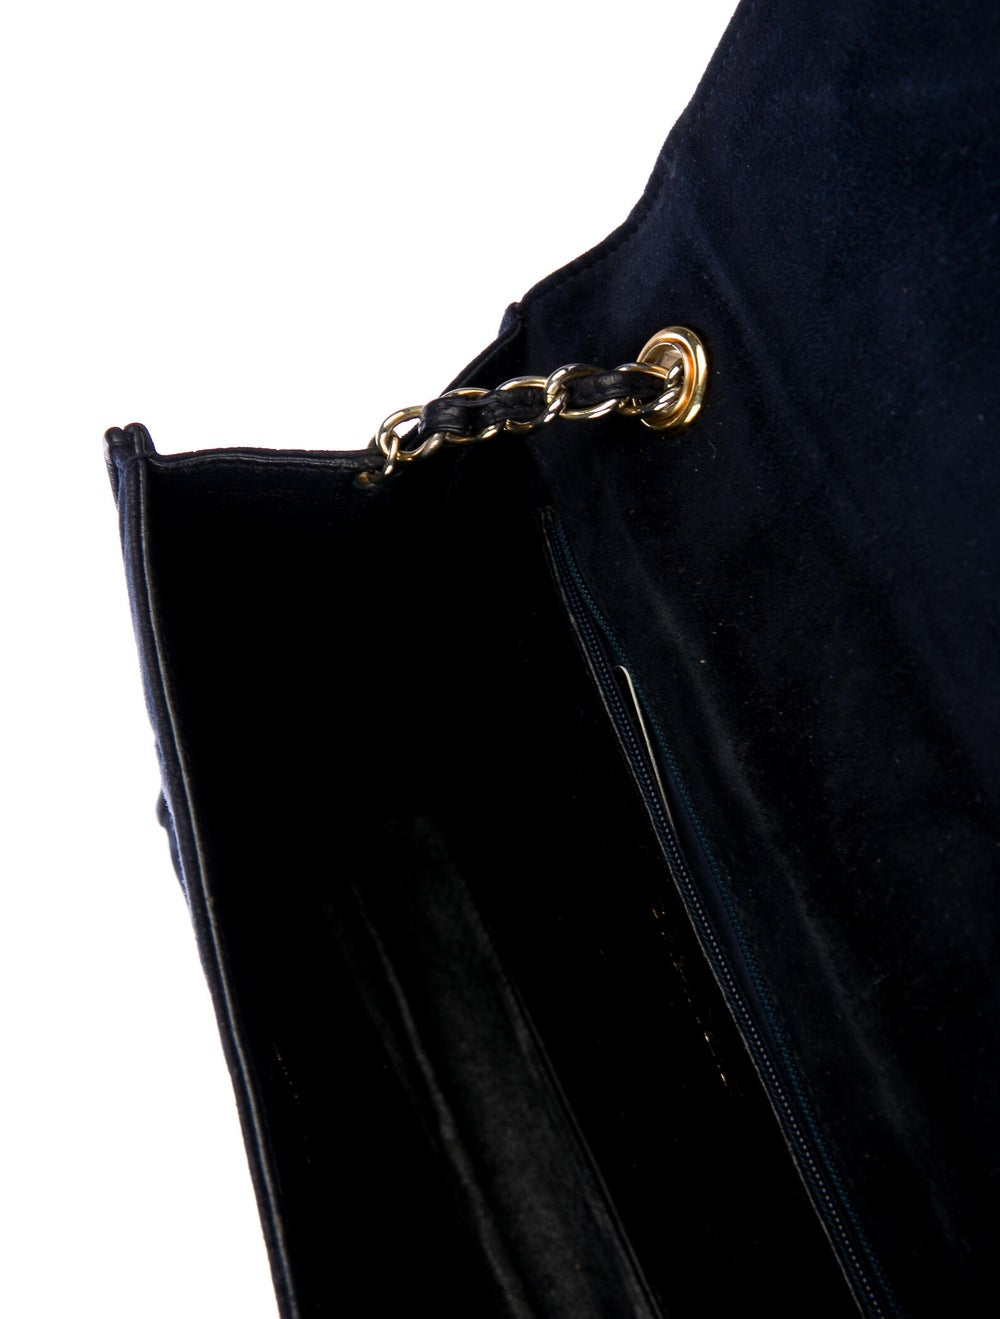 Chanel Vintage Quilted CC Flap Bag Blue - image 5